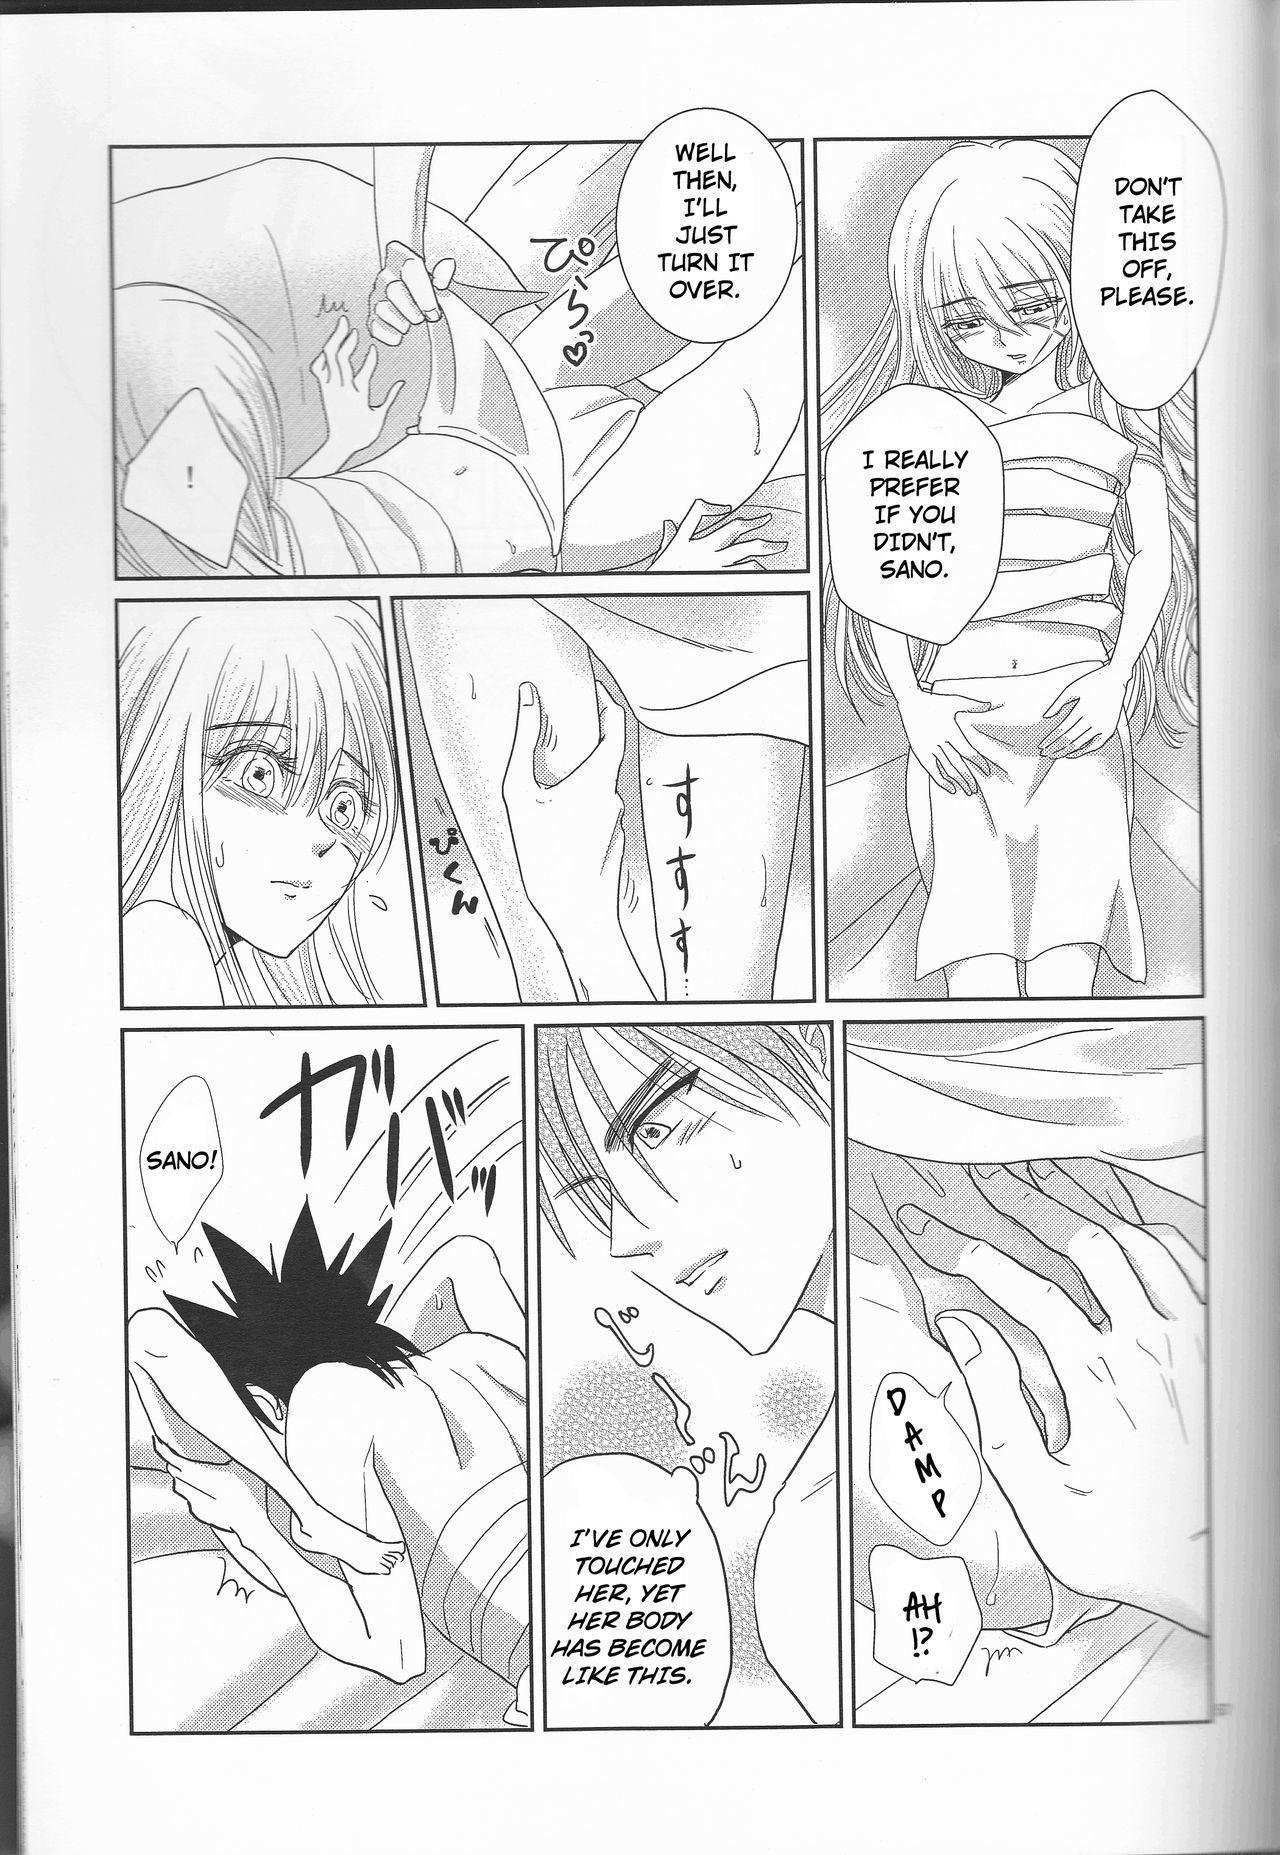 Hime ken ryoran page 57